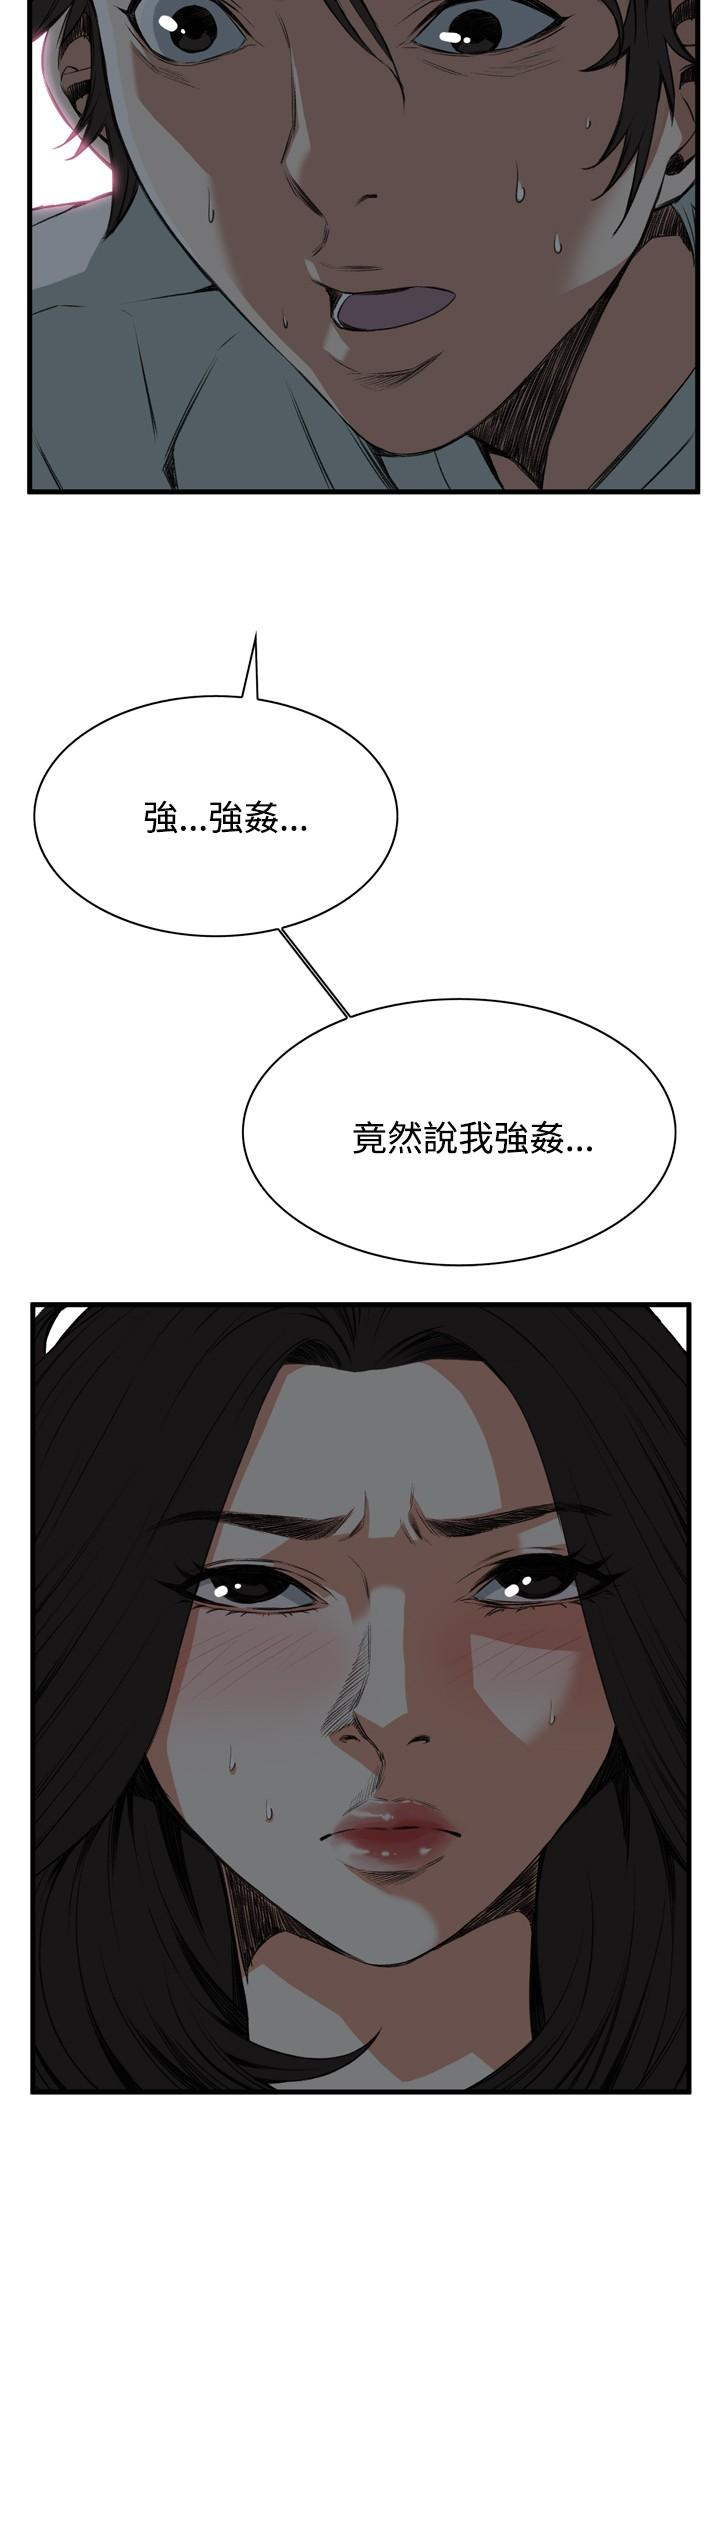 Take a Peek 偷窥 Ch.39~55 [Chinese]中文 198